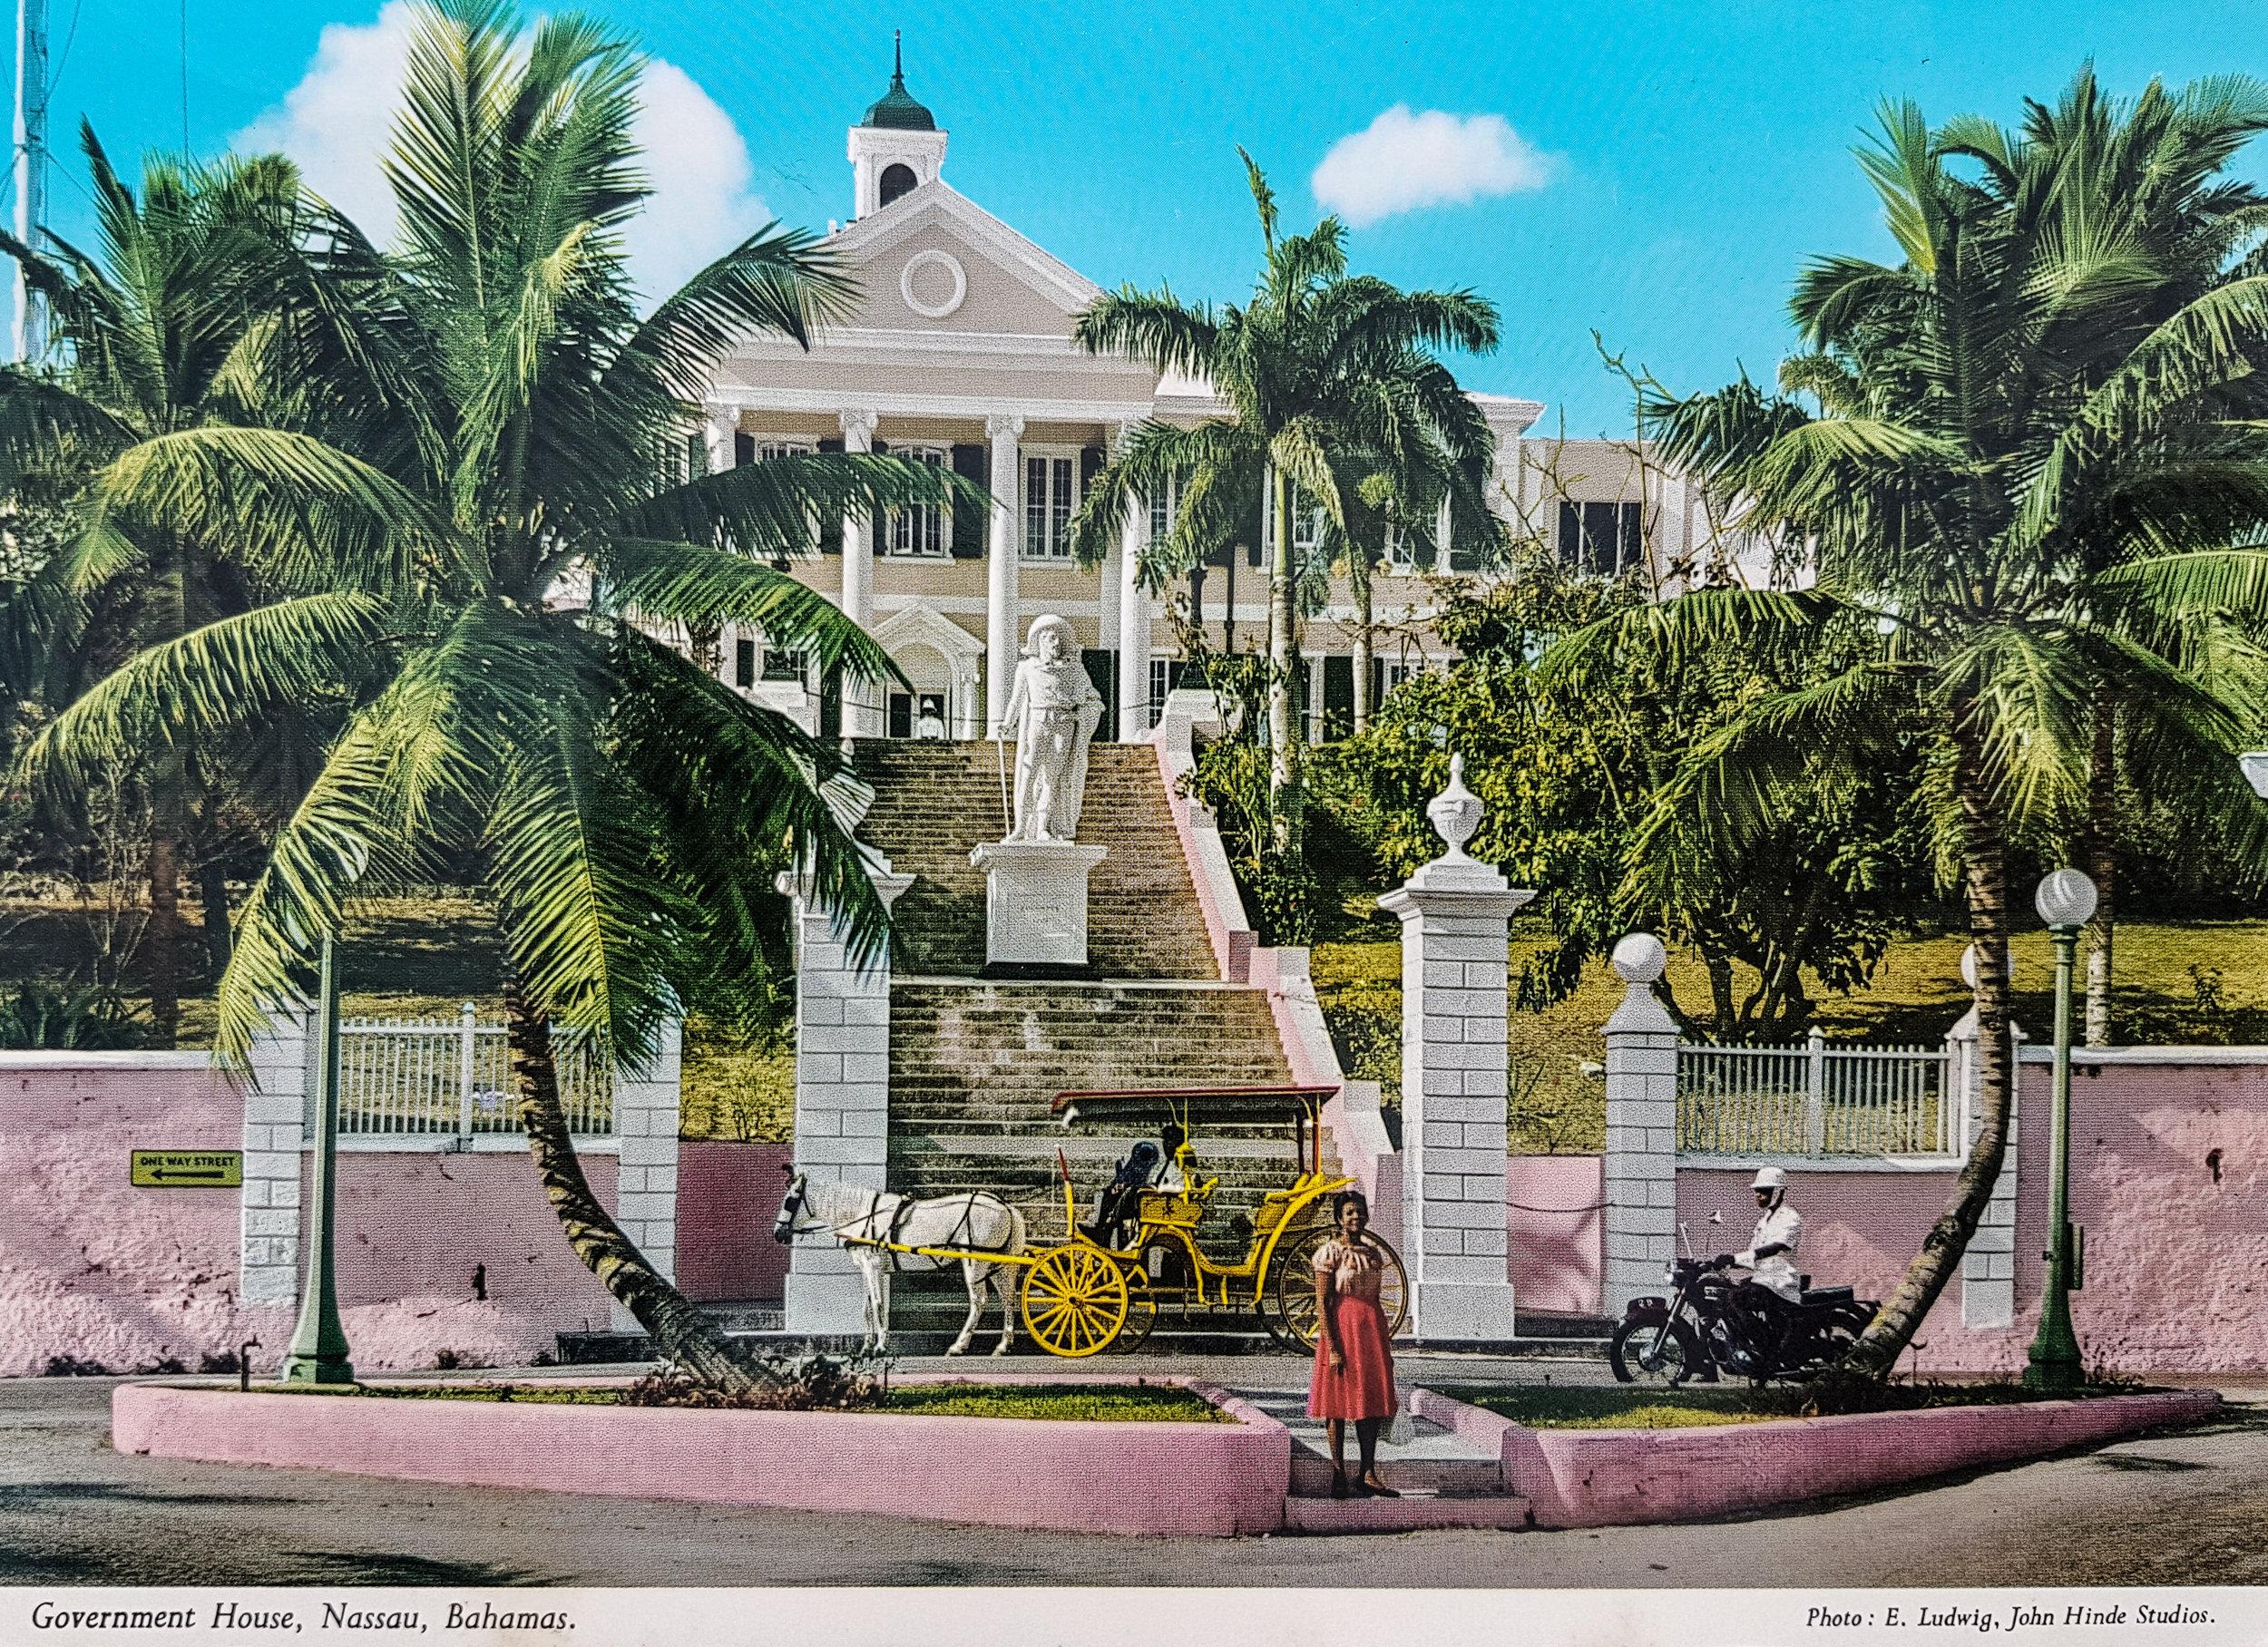 Government House, Nassau, Bahamas. Photo: E.Ludwig, John Hinde Studios.